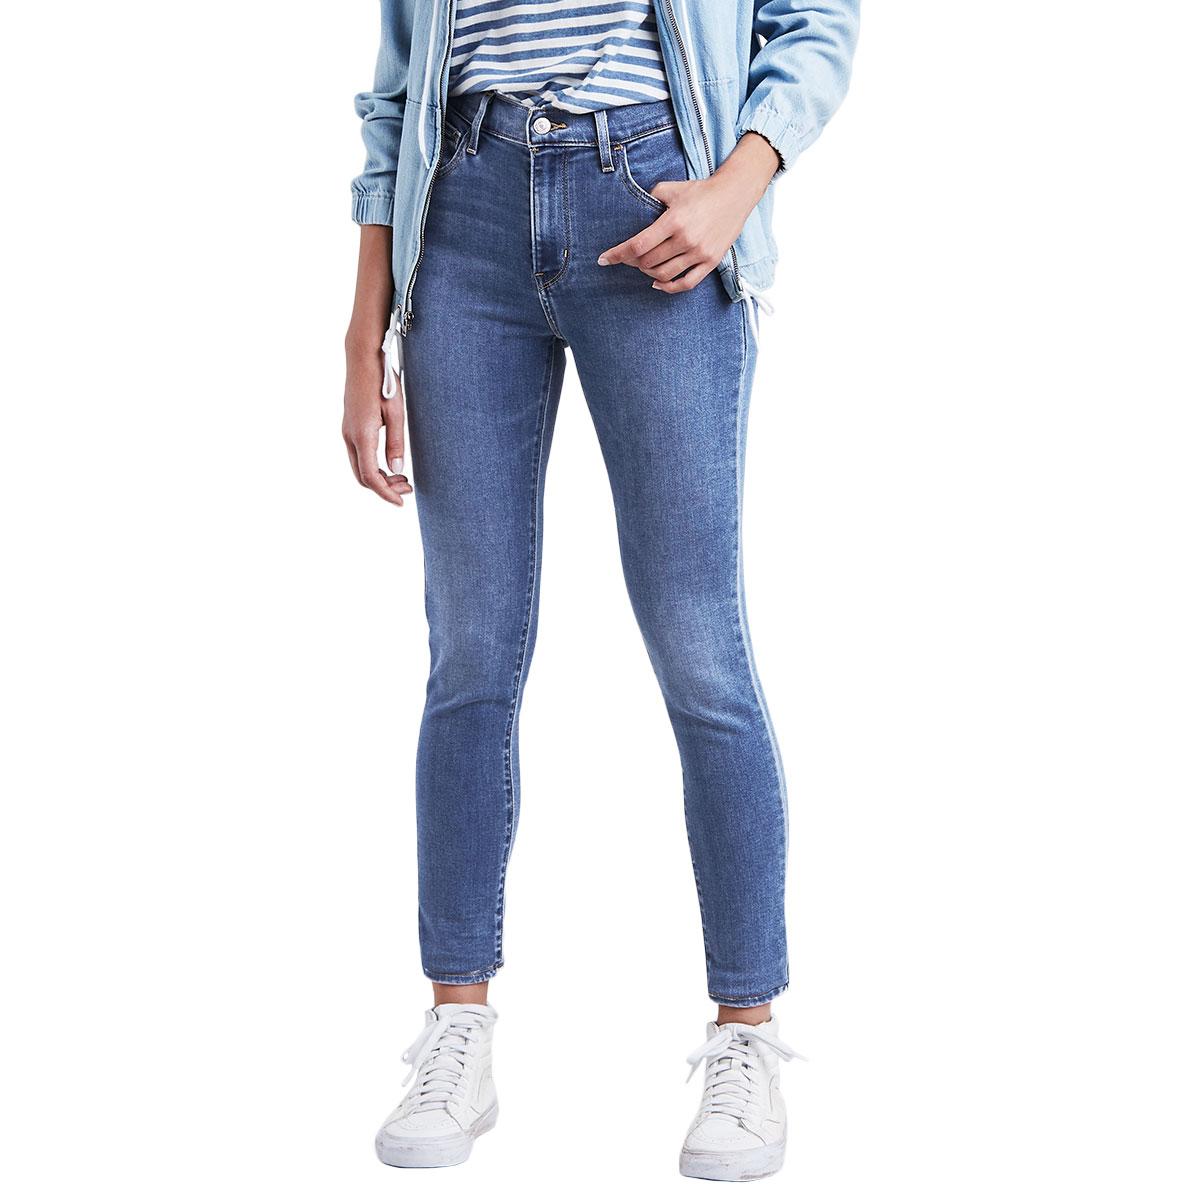 Levi's Women's 720 High Rise Super Skinny Jeans - Blue, 26